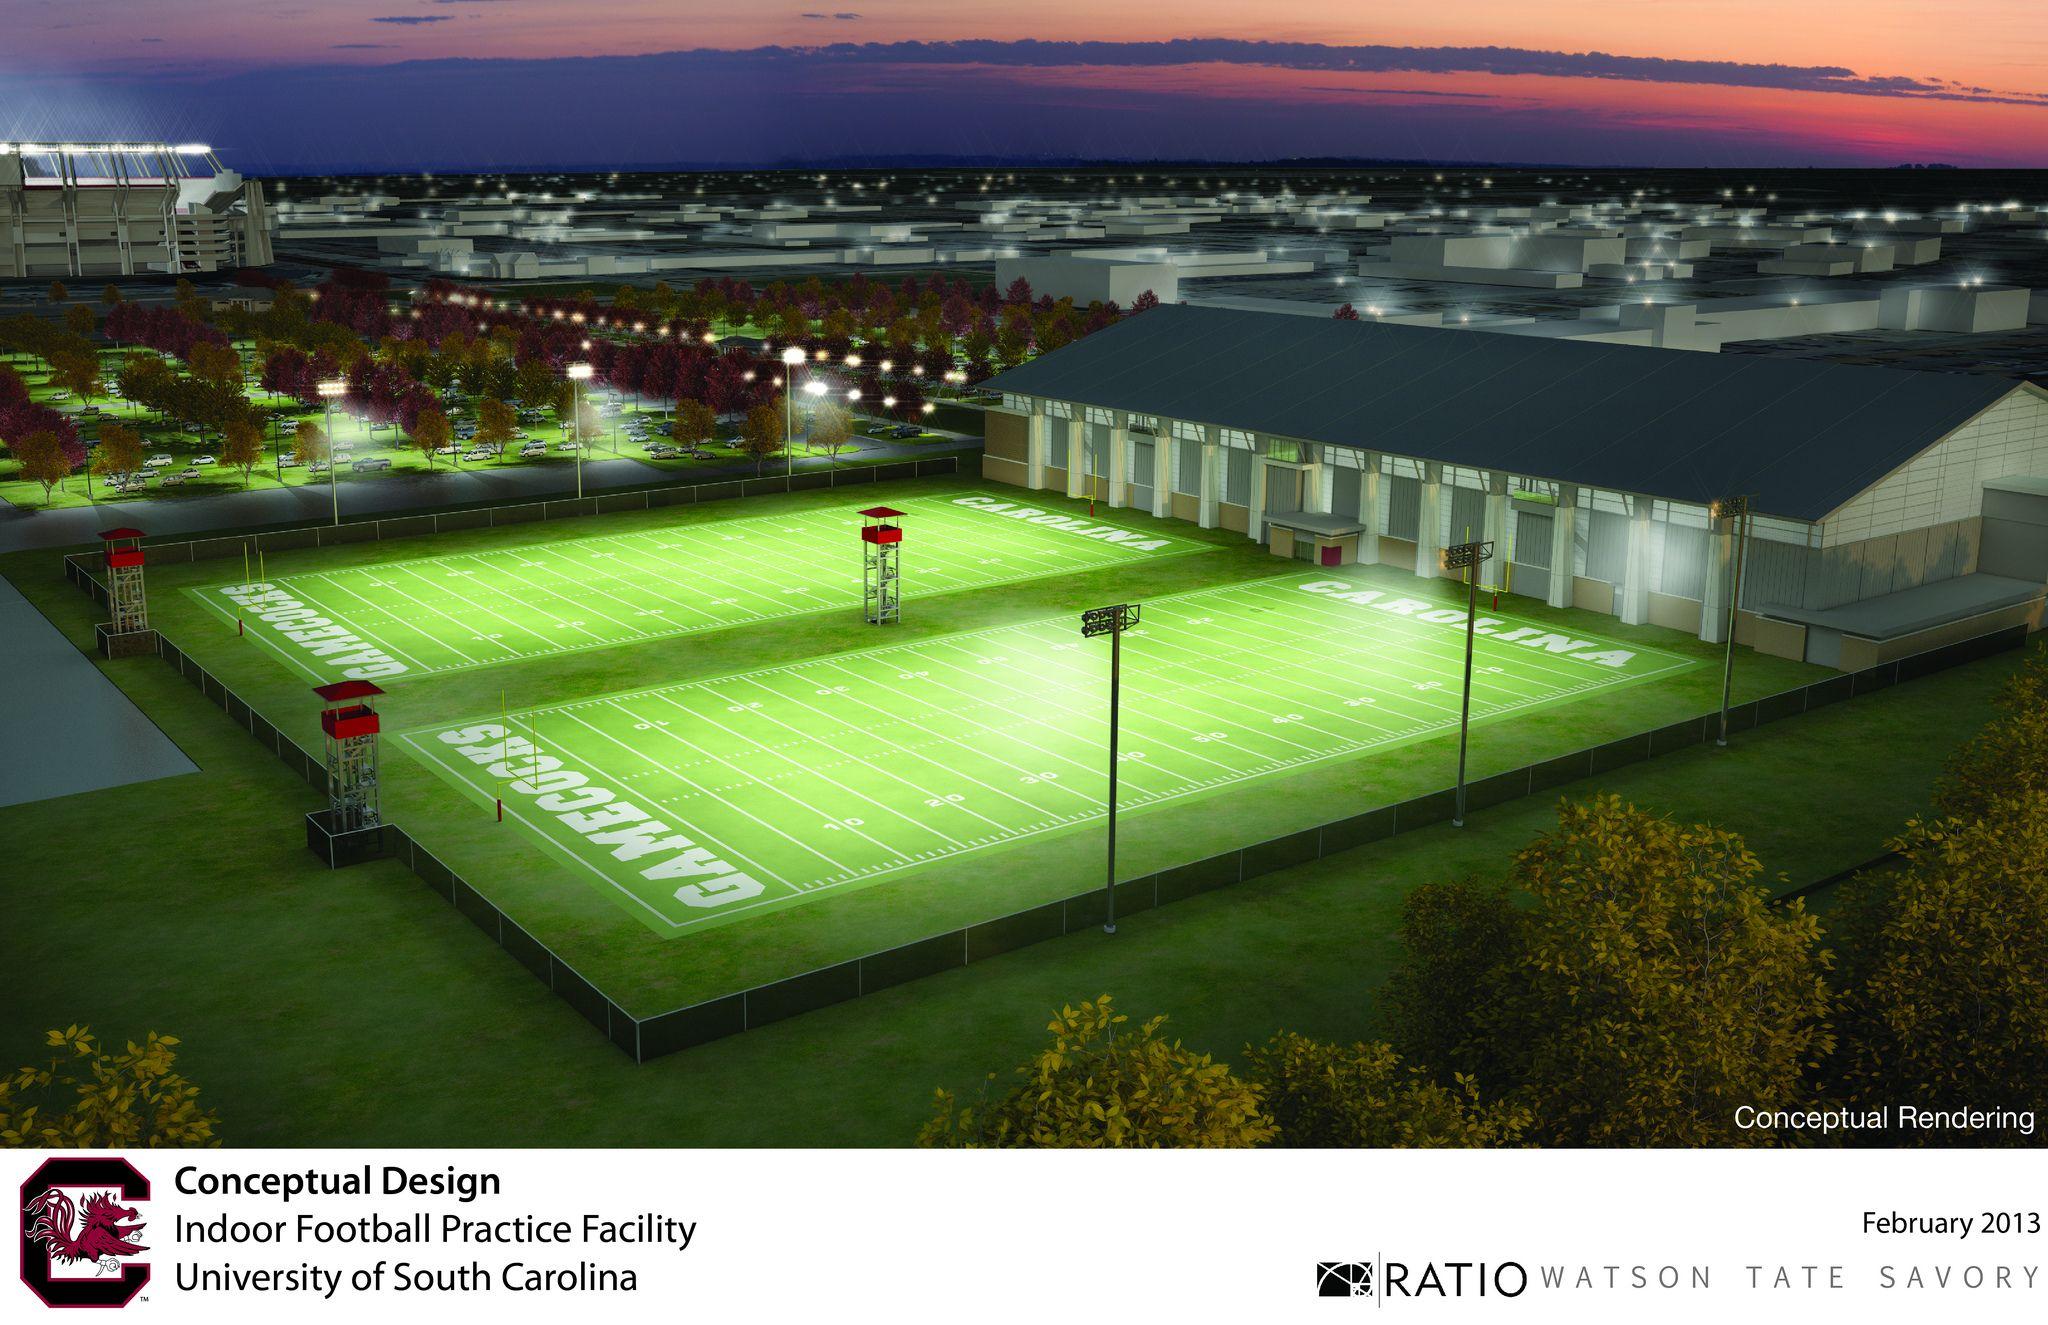 Football Indoor Practice Facility Conceptual Rendering Sportsplex Soccer Field Football Field